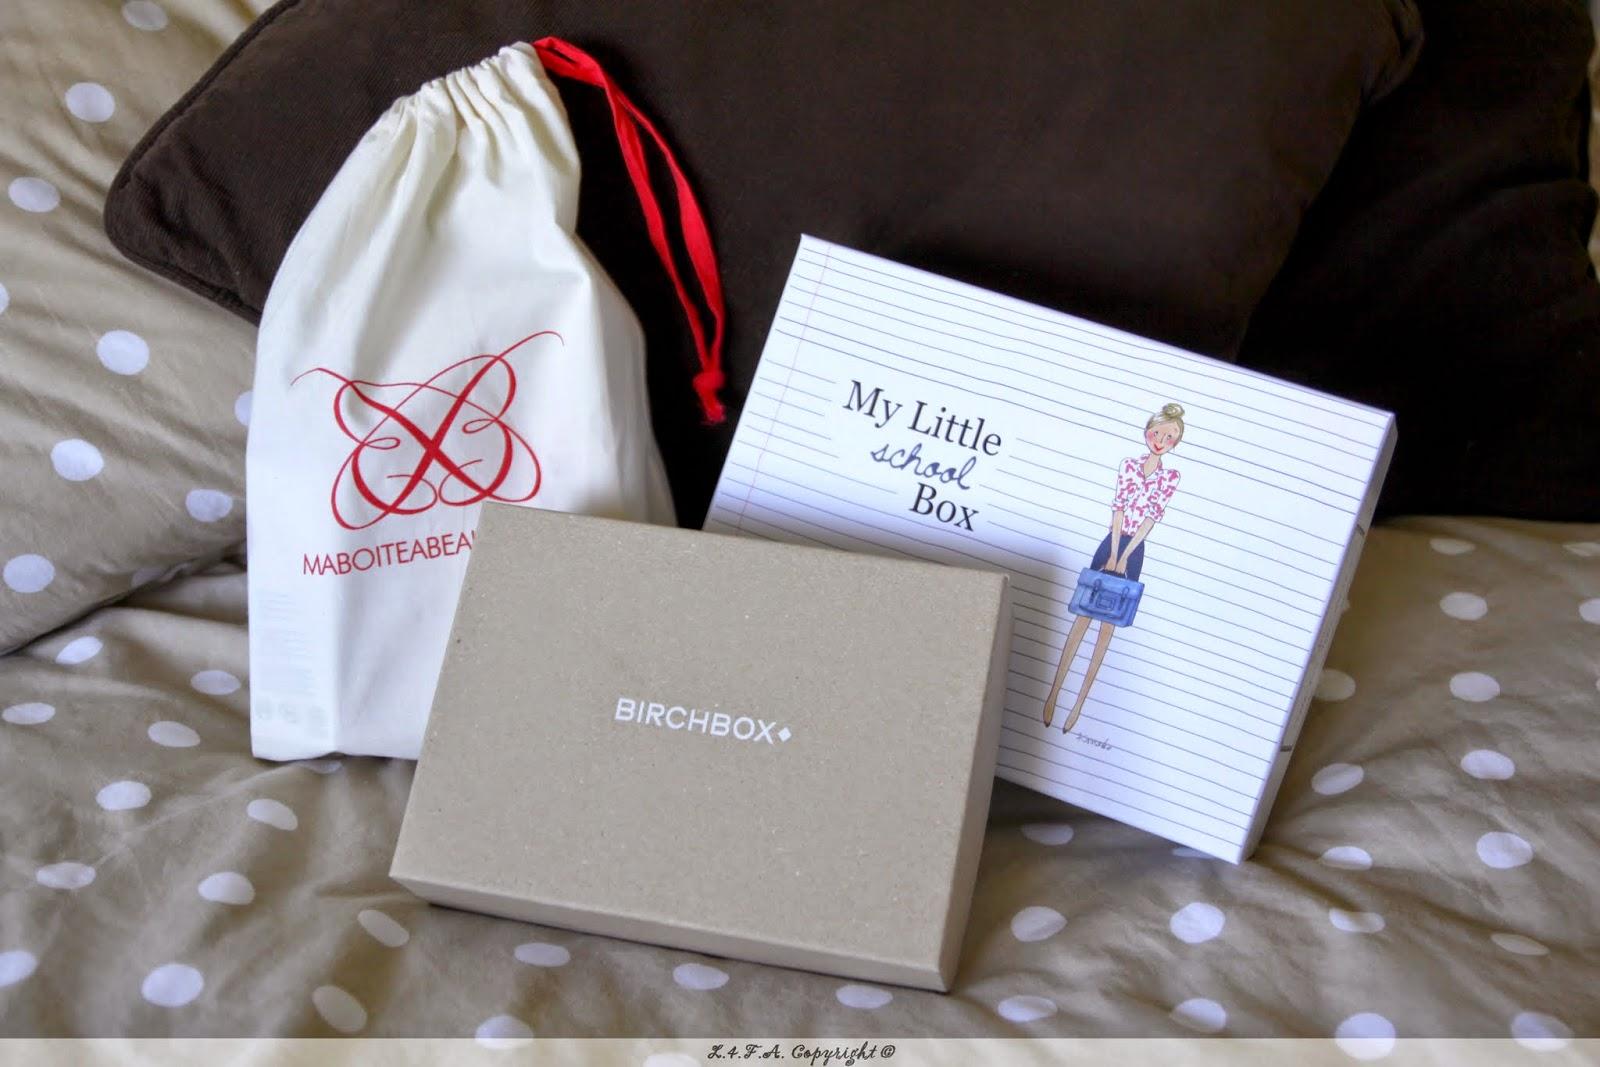 http://lesquatrefersenlair.blogspot.com/2014/09/my-little-box-birchbox-ou-ma-boite.html